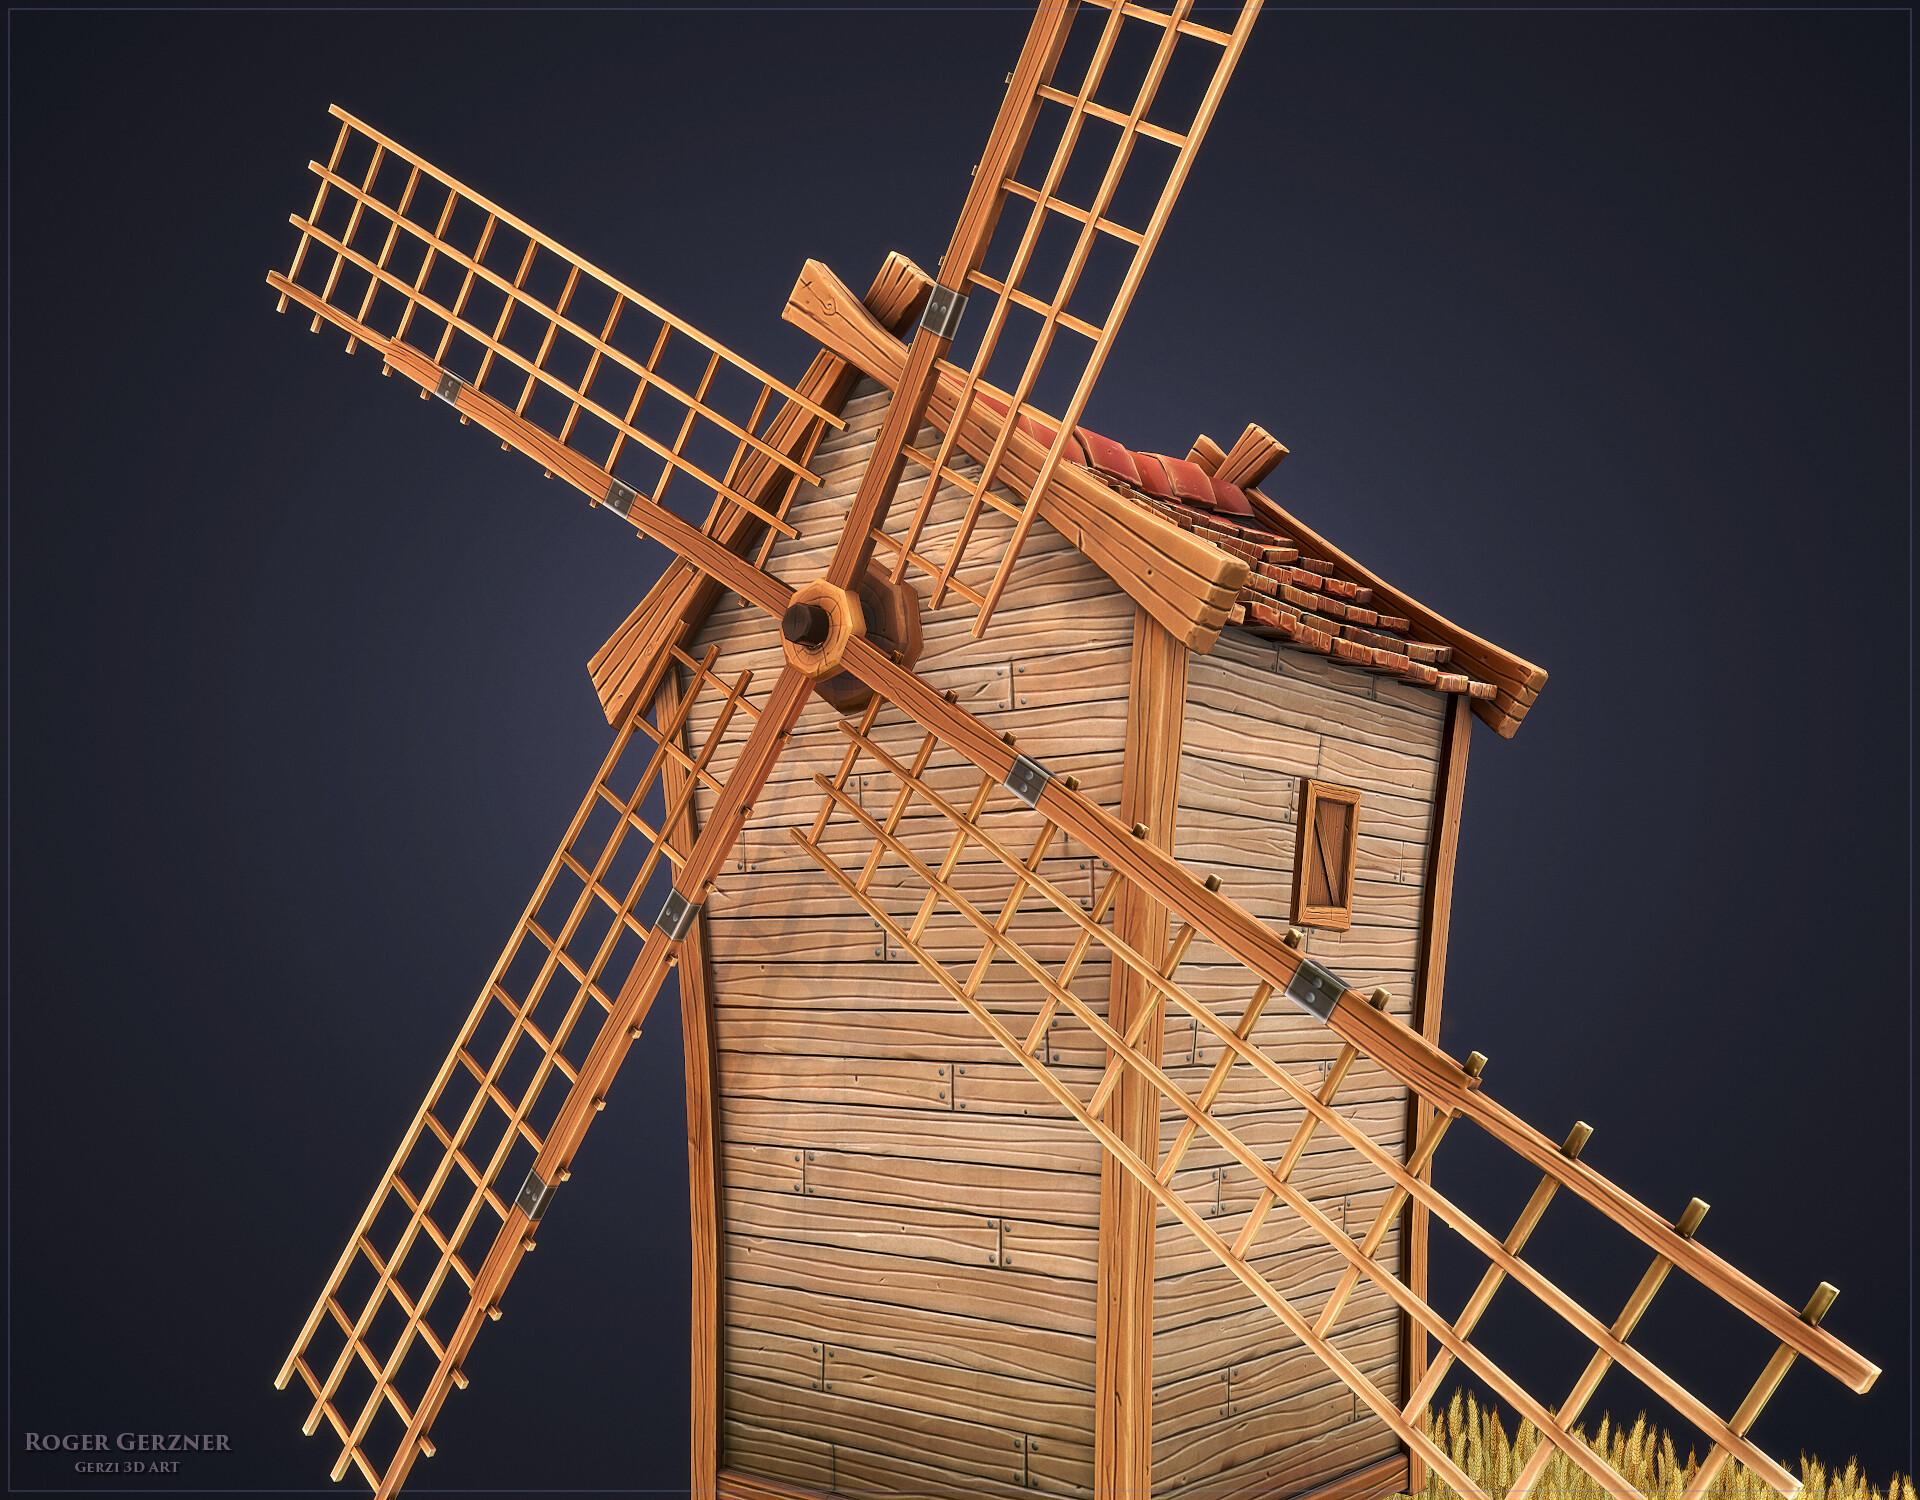 Roger gerzner rogergerzner windmill 02